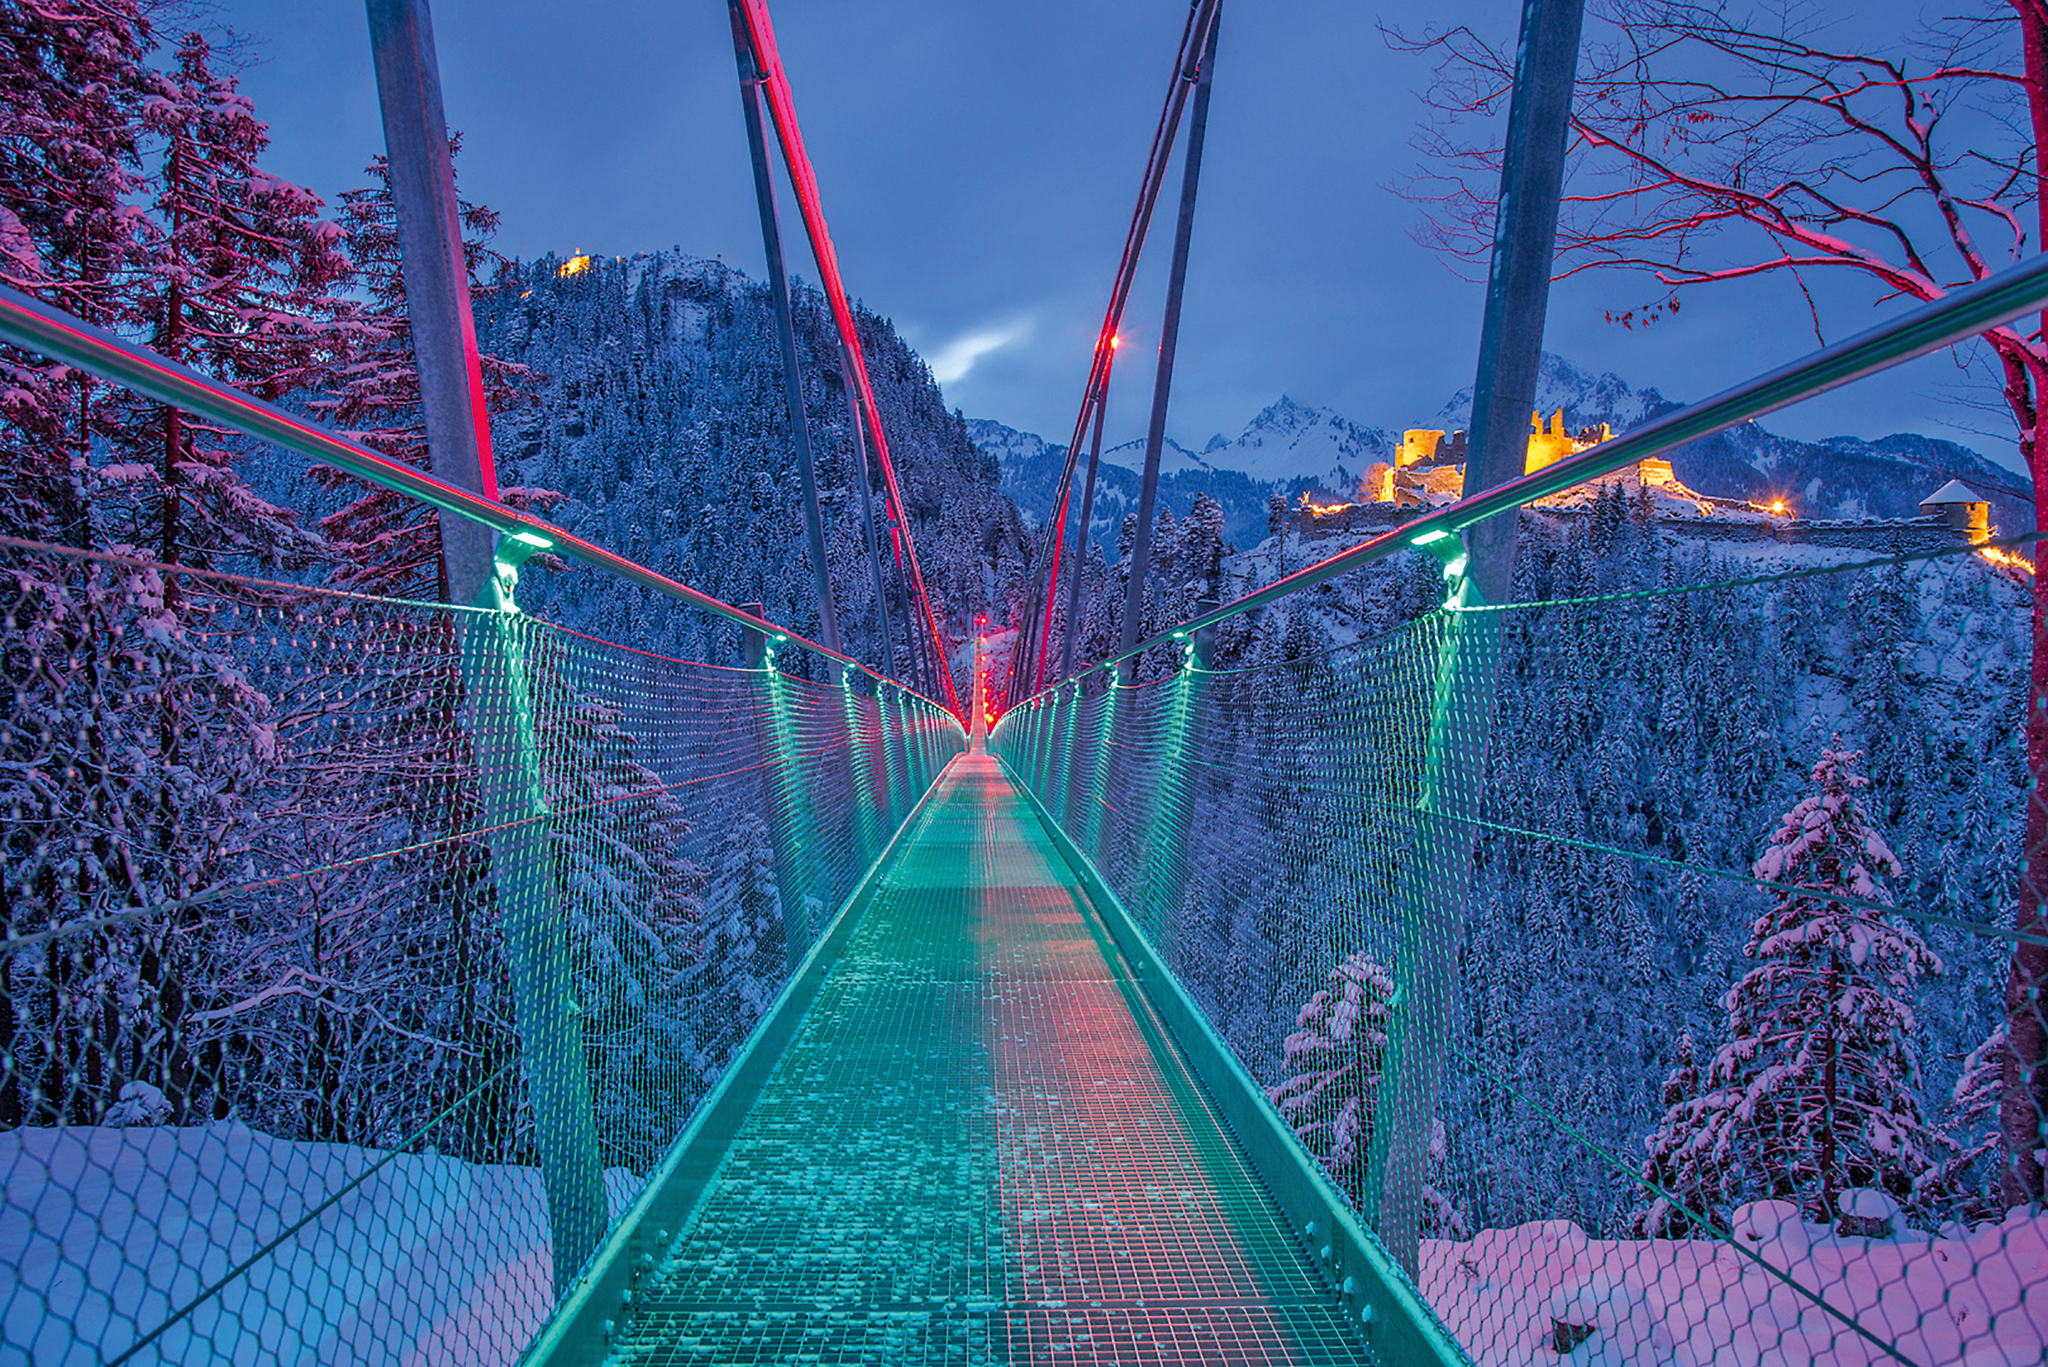 Fußgängerhängebrücke highline179 © Naturparkregion Reutte, Rolf Marke